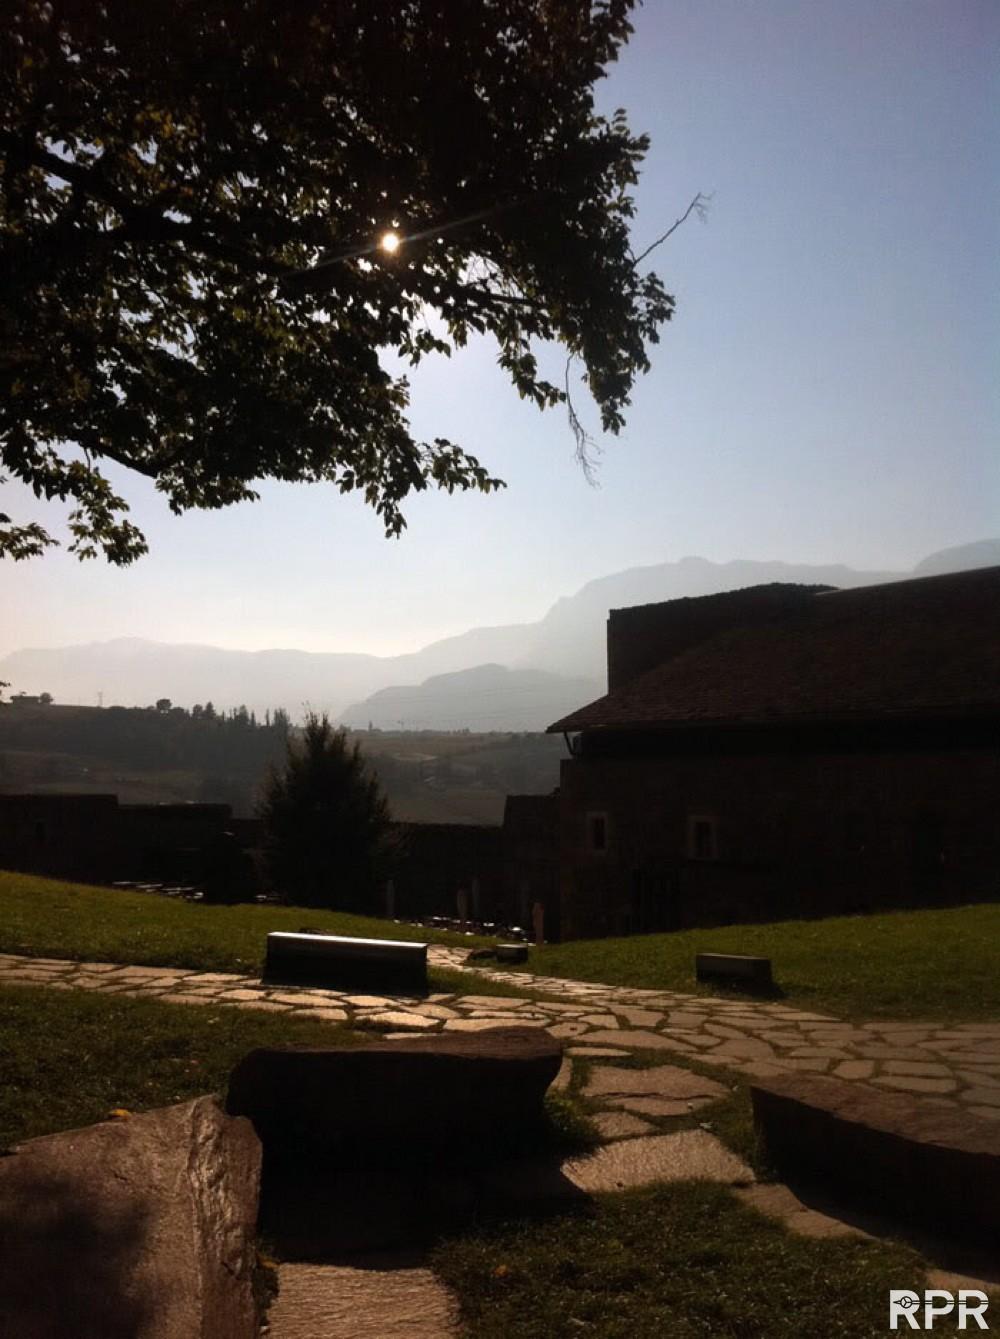 rpr_Messner_17